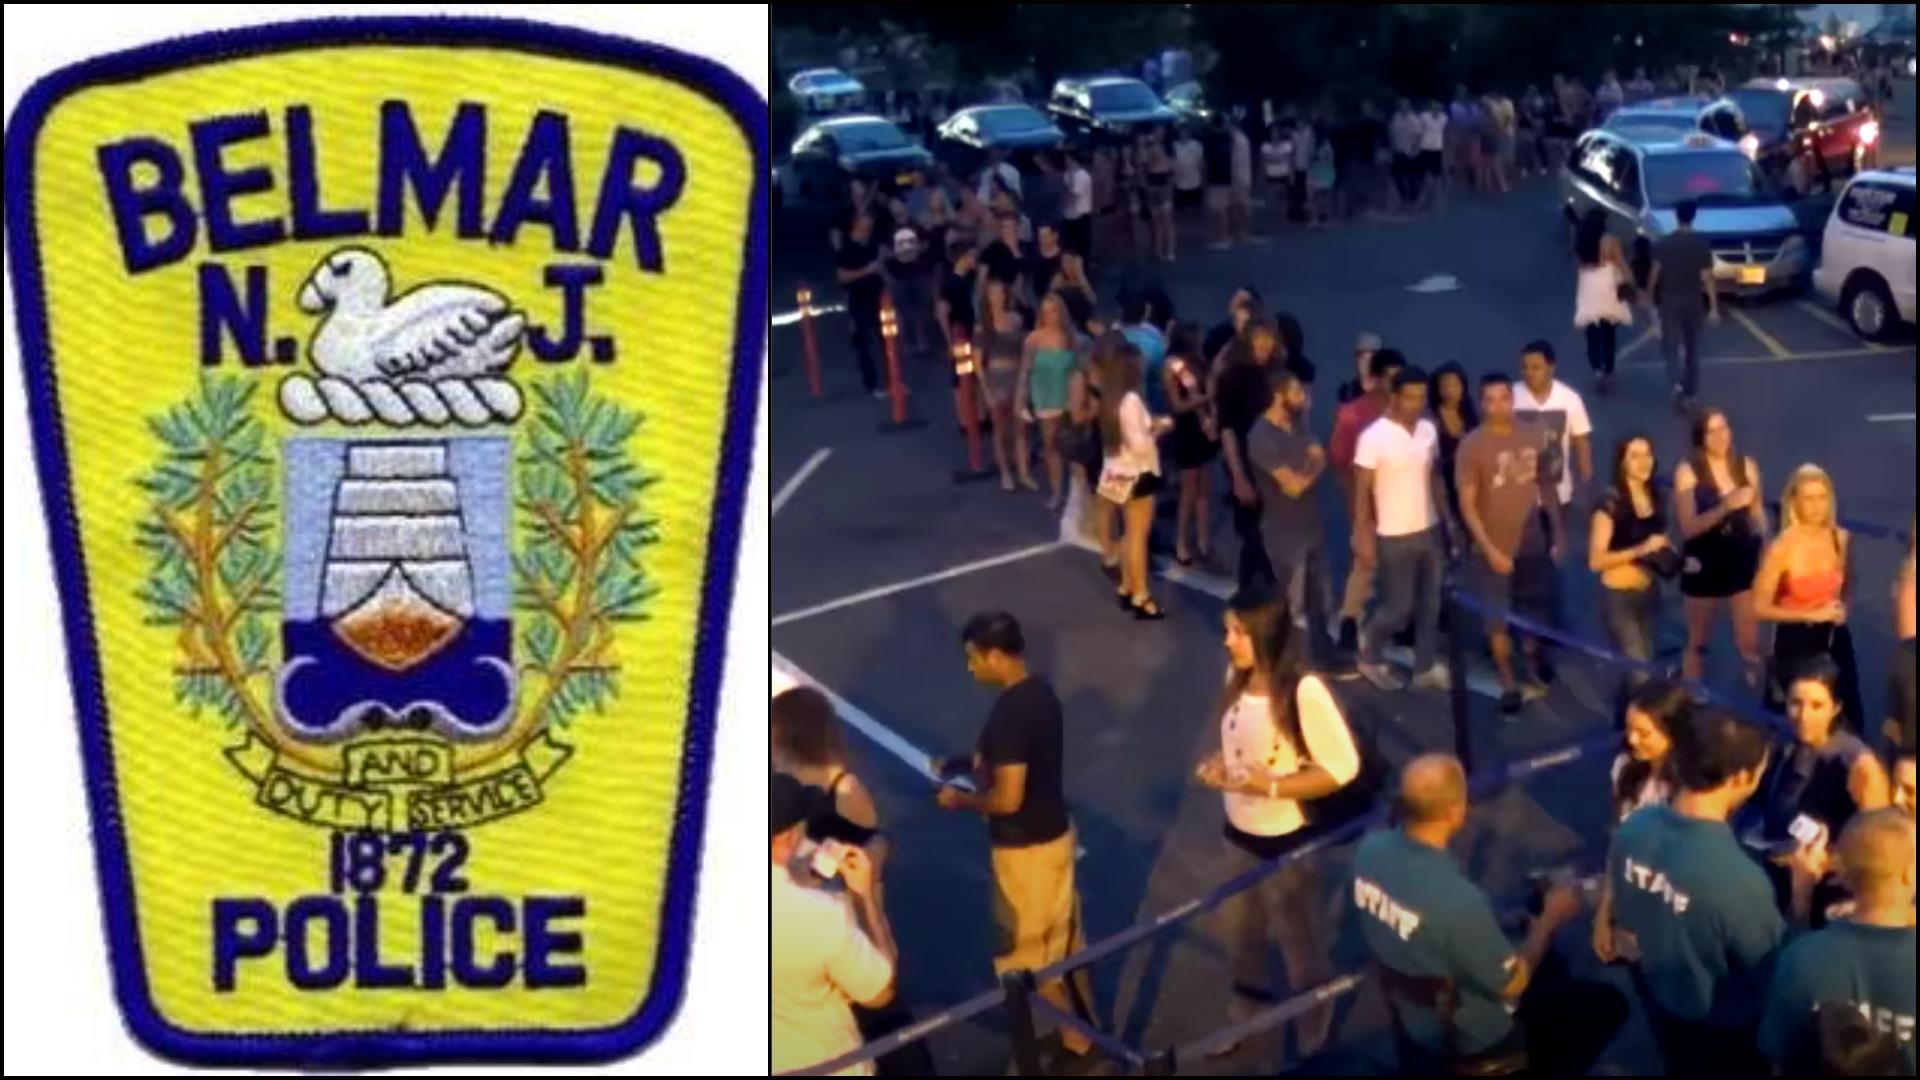 Belmar Police - Bar Anticipation